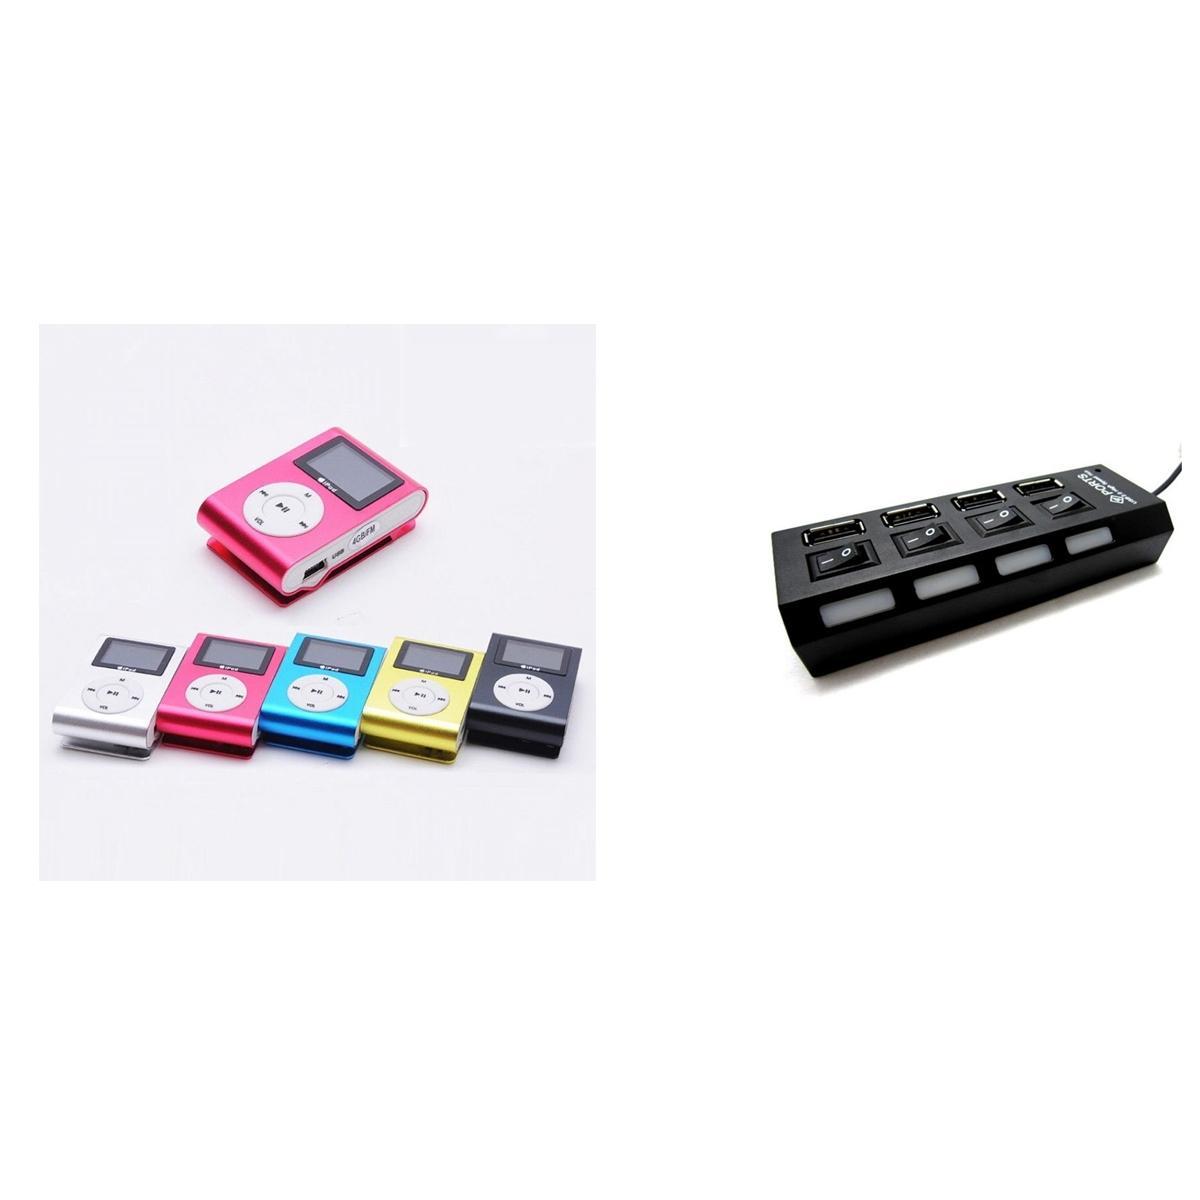 Combo Of Pink Usb Mini Clip Mp3 Player + 4 Port USB Hub